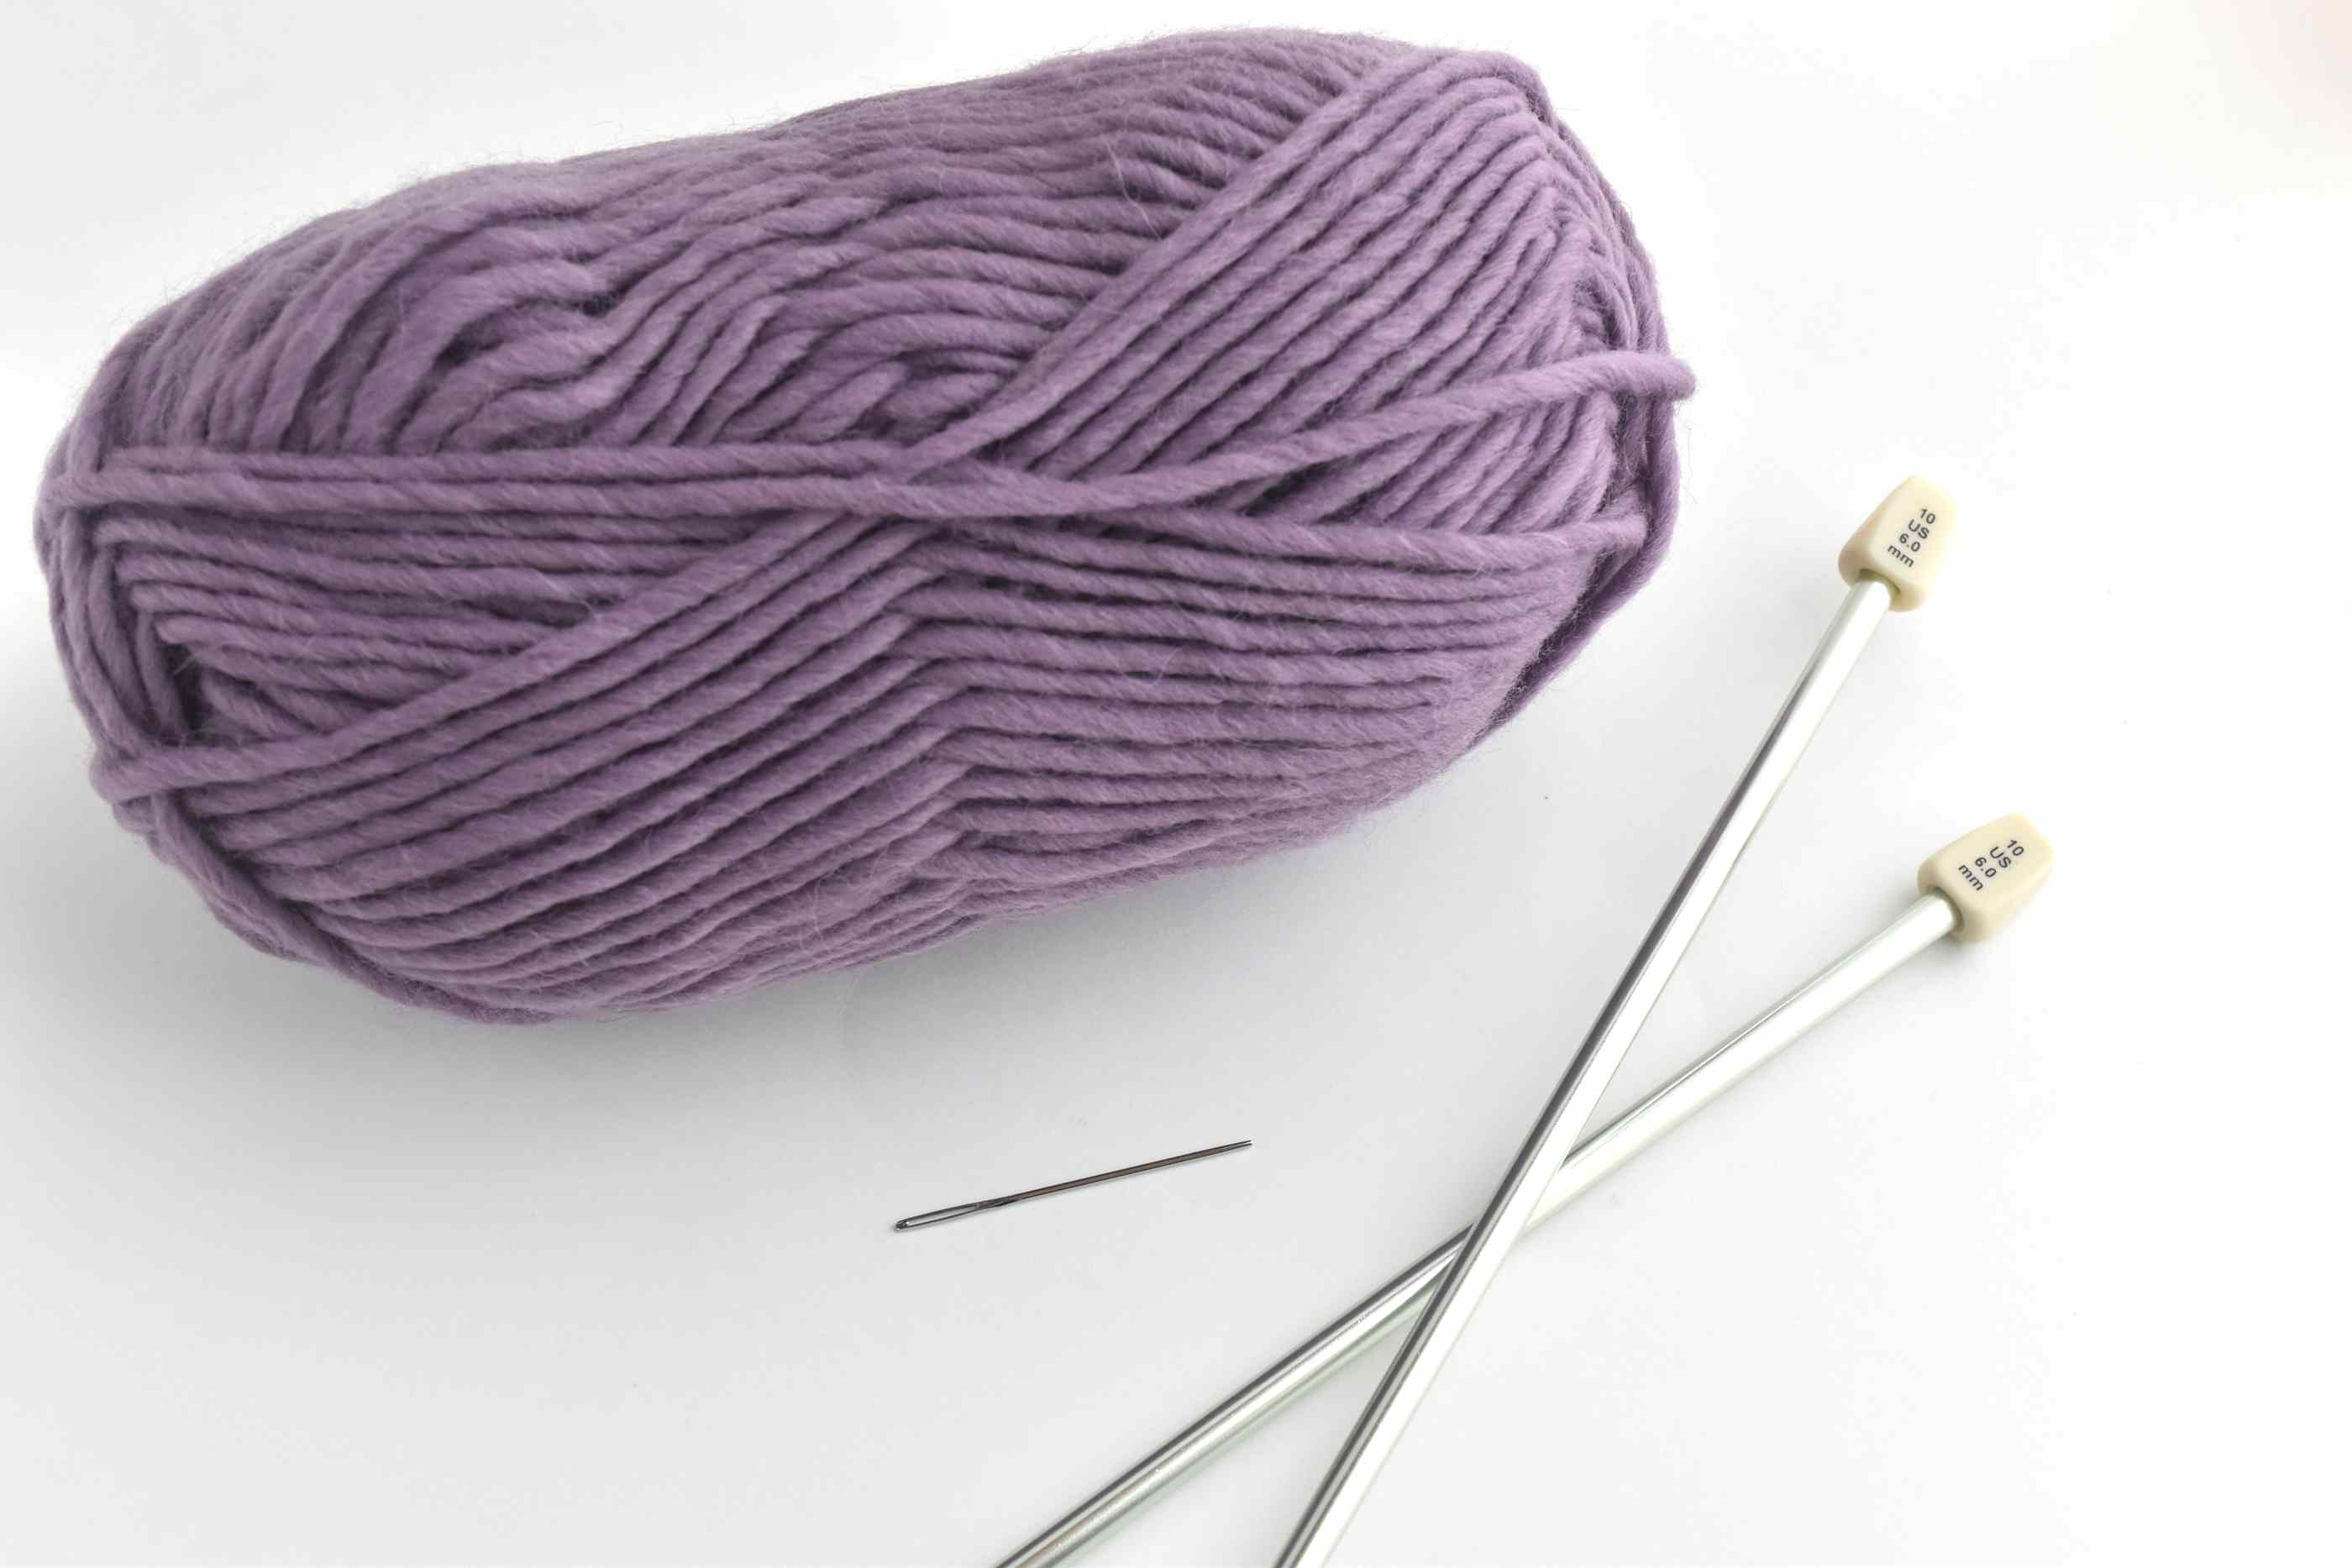 Yarn Skein, Knitting Needles, and Yarn Needle